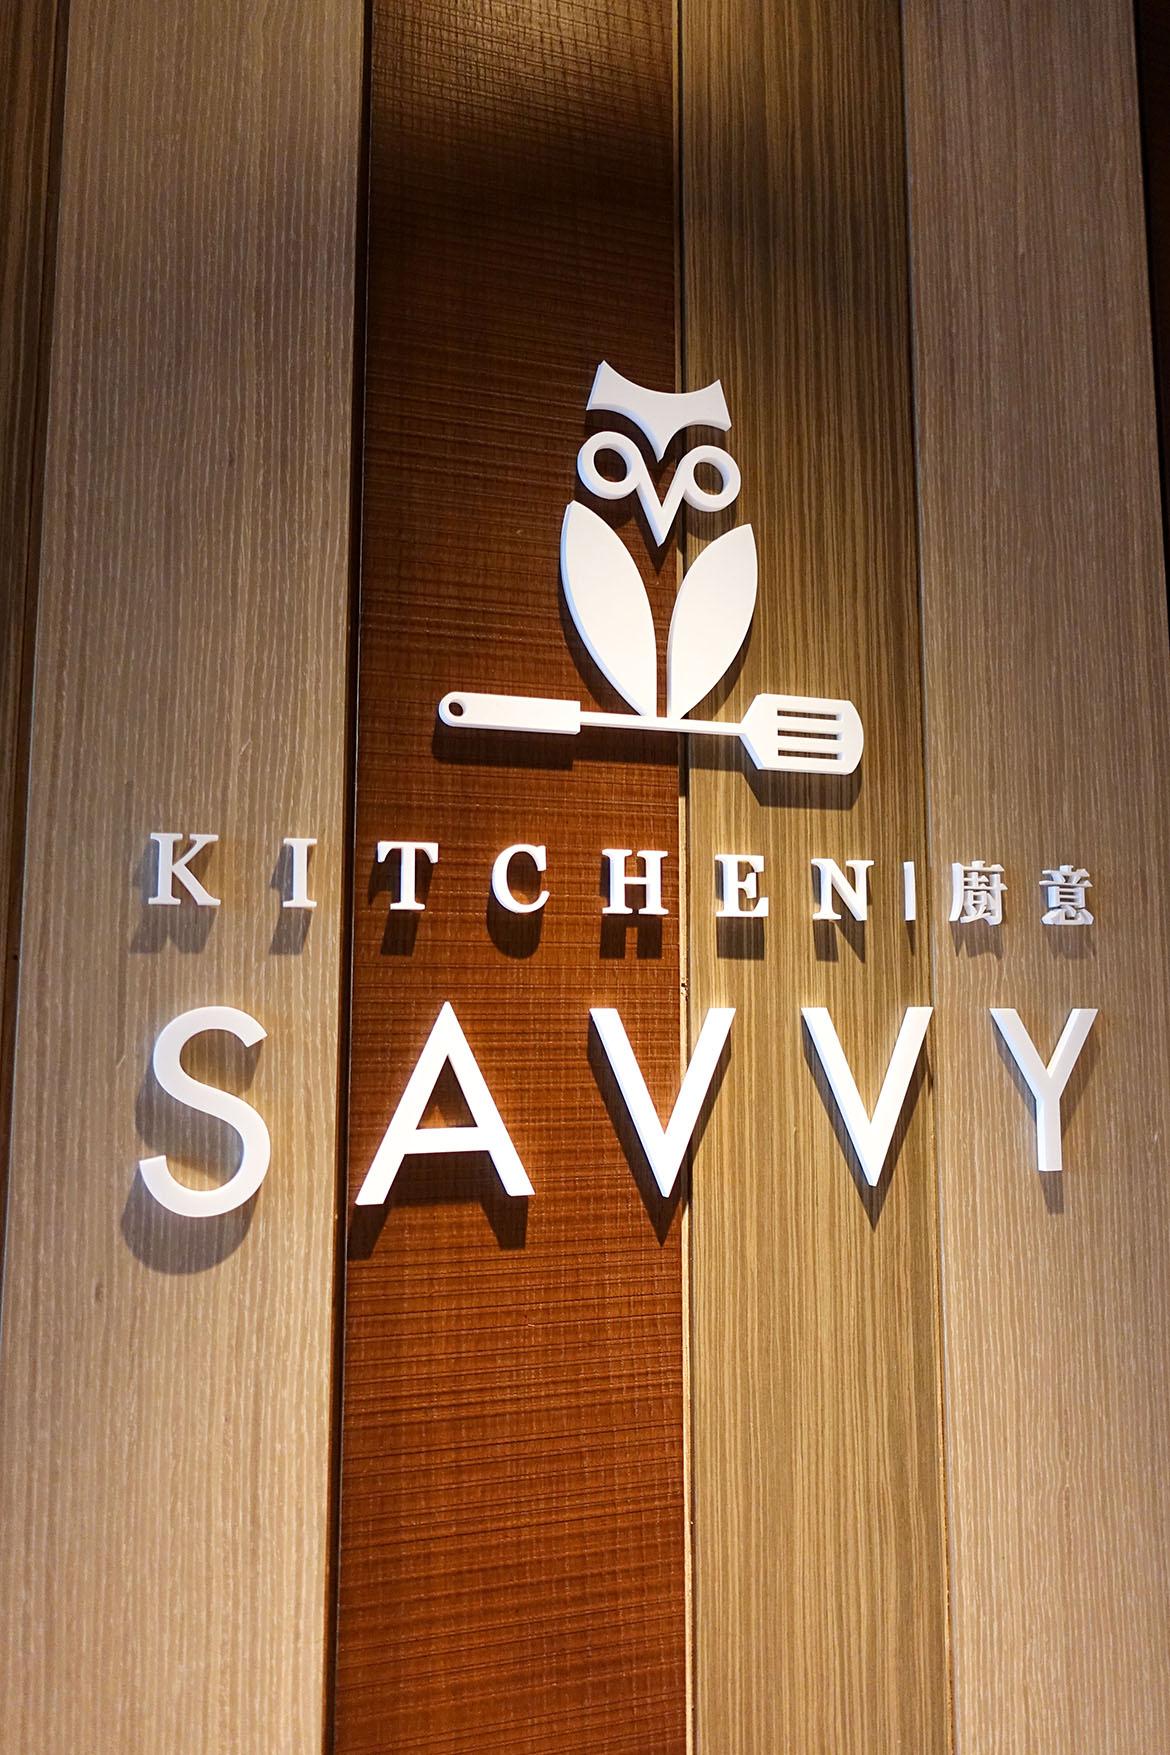 廚意 Kitchen Savvy